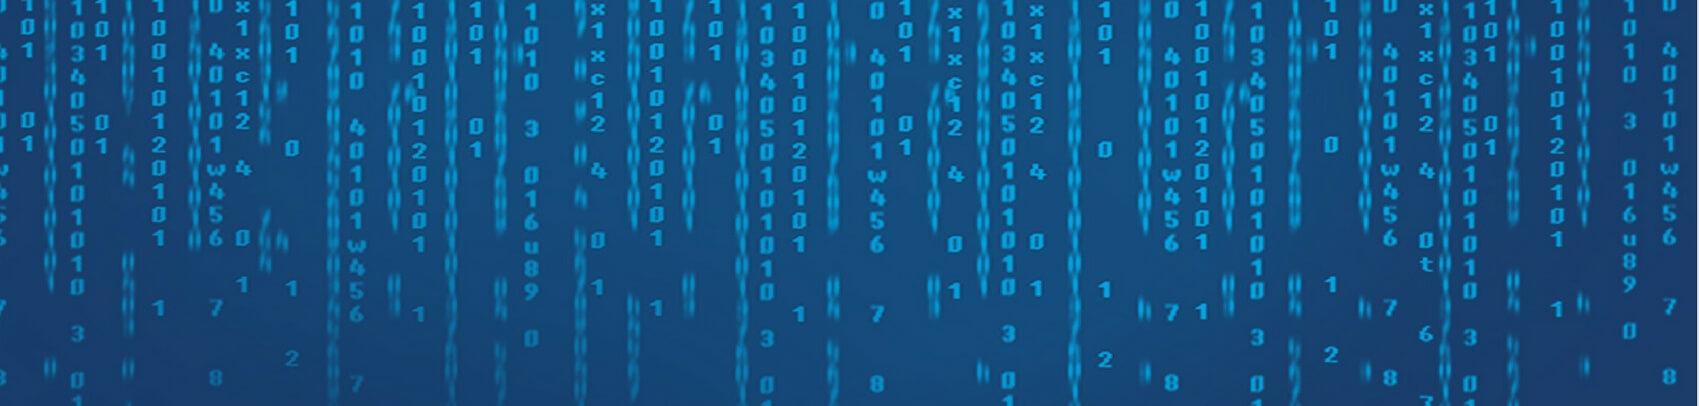 Cyber Mangement Alliance